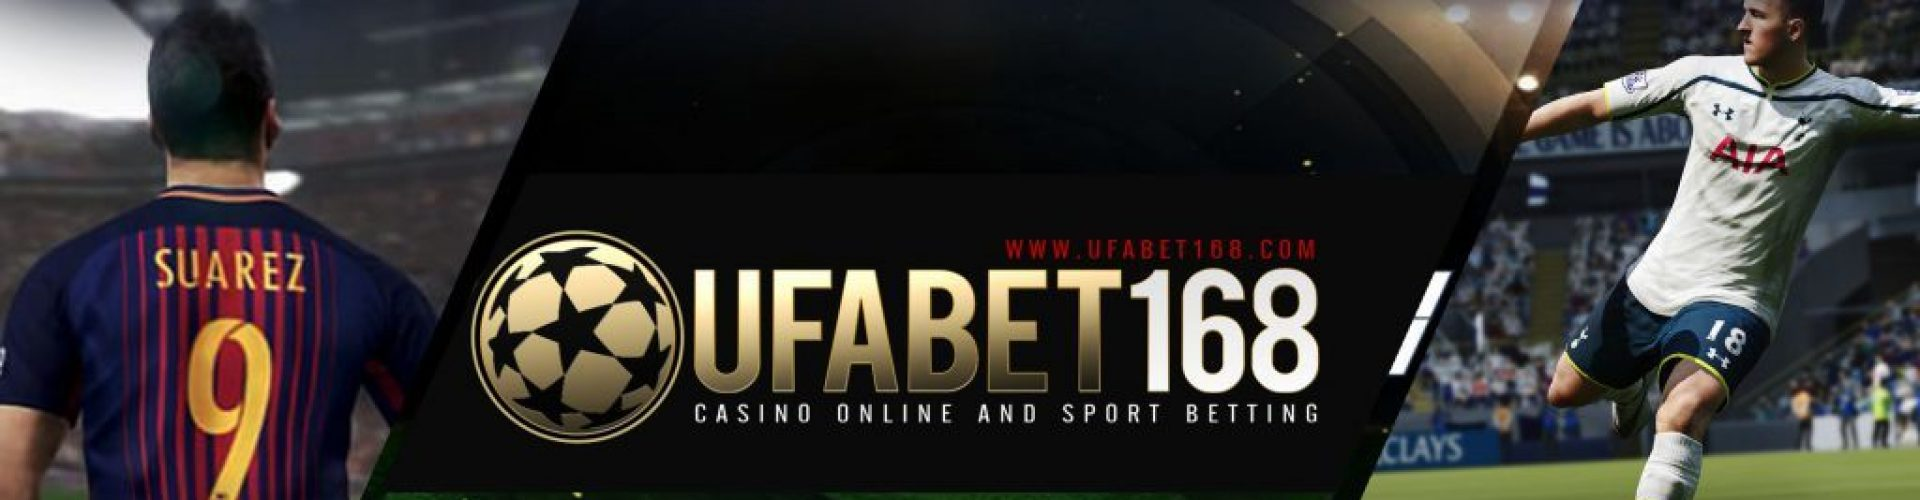 UFABET แทงบอลออนไลน์ บาคาร่าออนไลน์ เว็บพนันออนไลน์ที่ดีที่สุด UFABET168